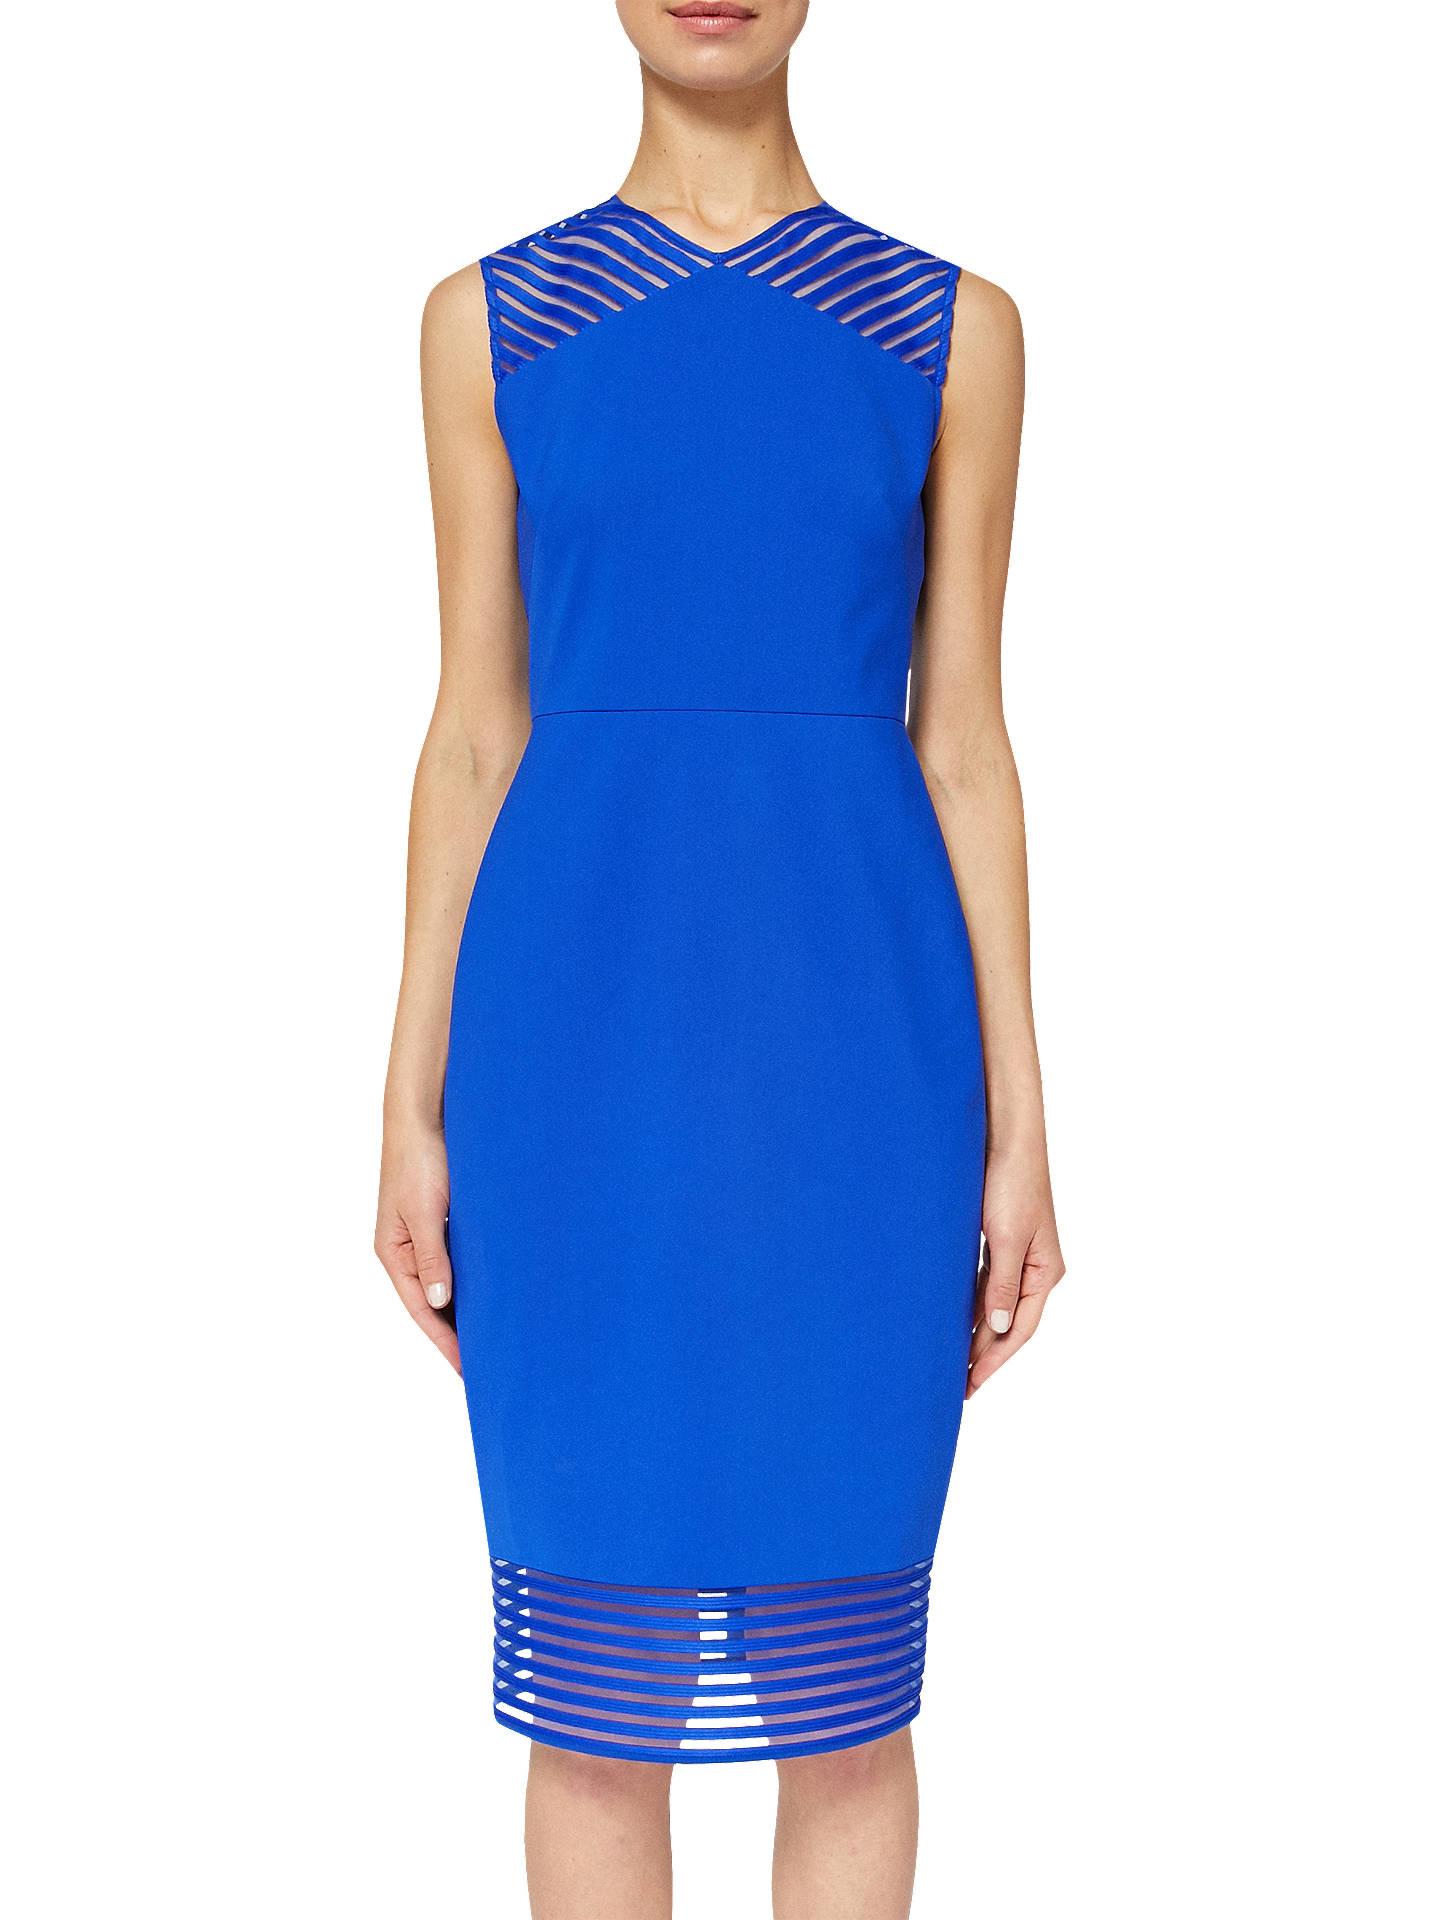 0c4e1aaf0 Buy Ted Baker Lucette Bodycon Dress